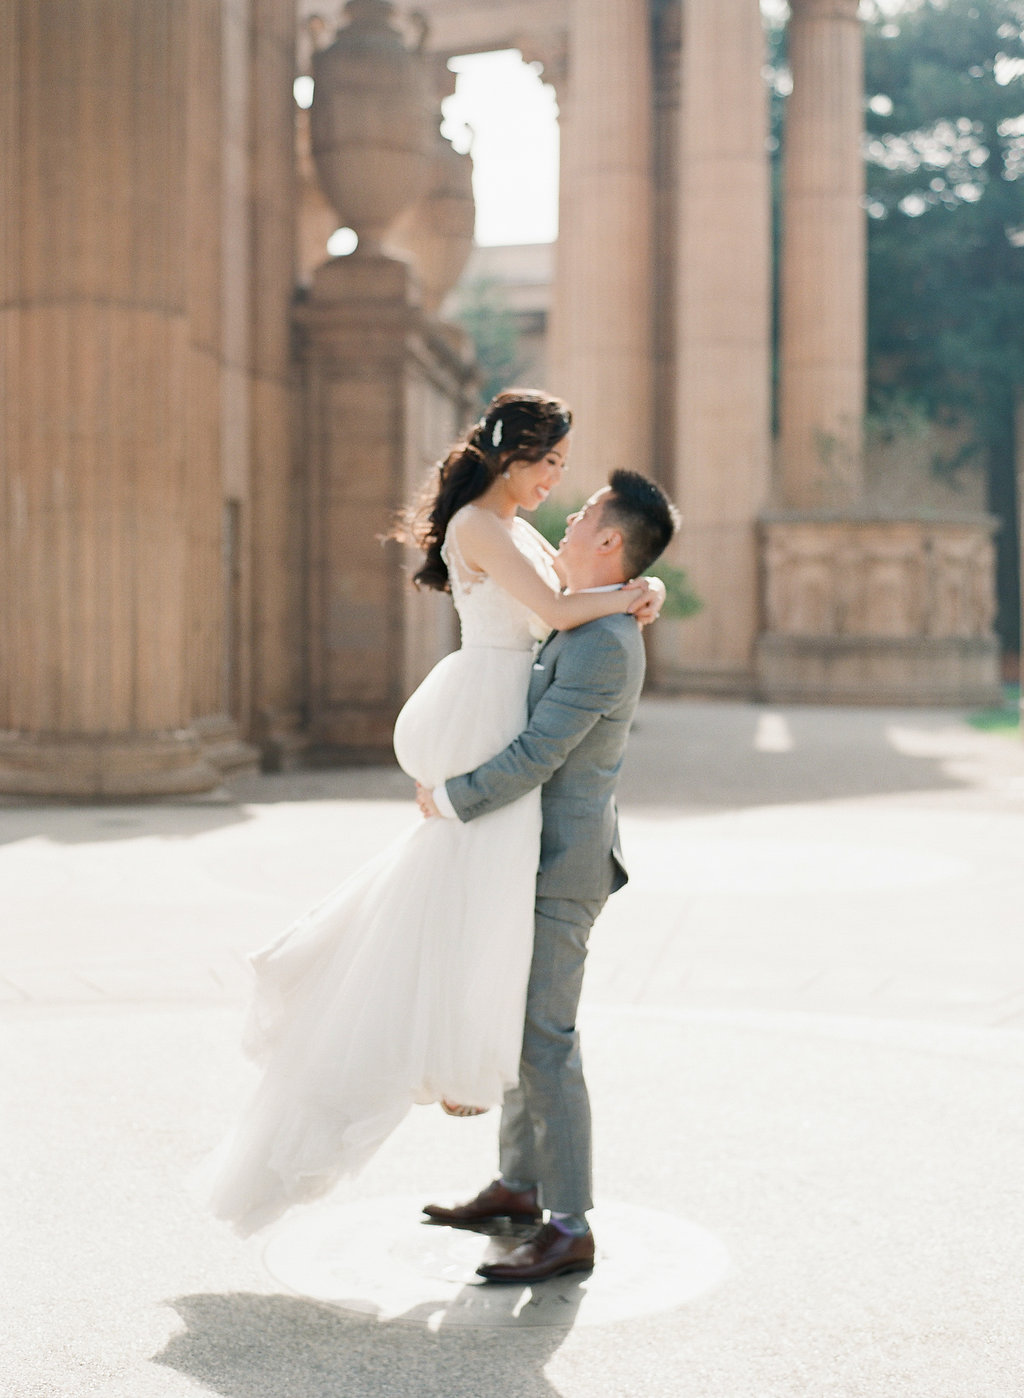 JennySoiPhotography-EJCityHallWedding-302.jpgSan Francisco City Hall Elopement Wedding Fine Art Film Photographer - Romantic natural light wedding photos